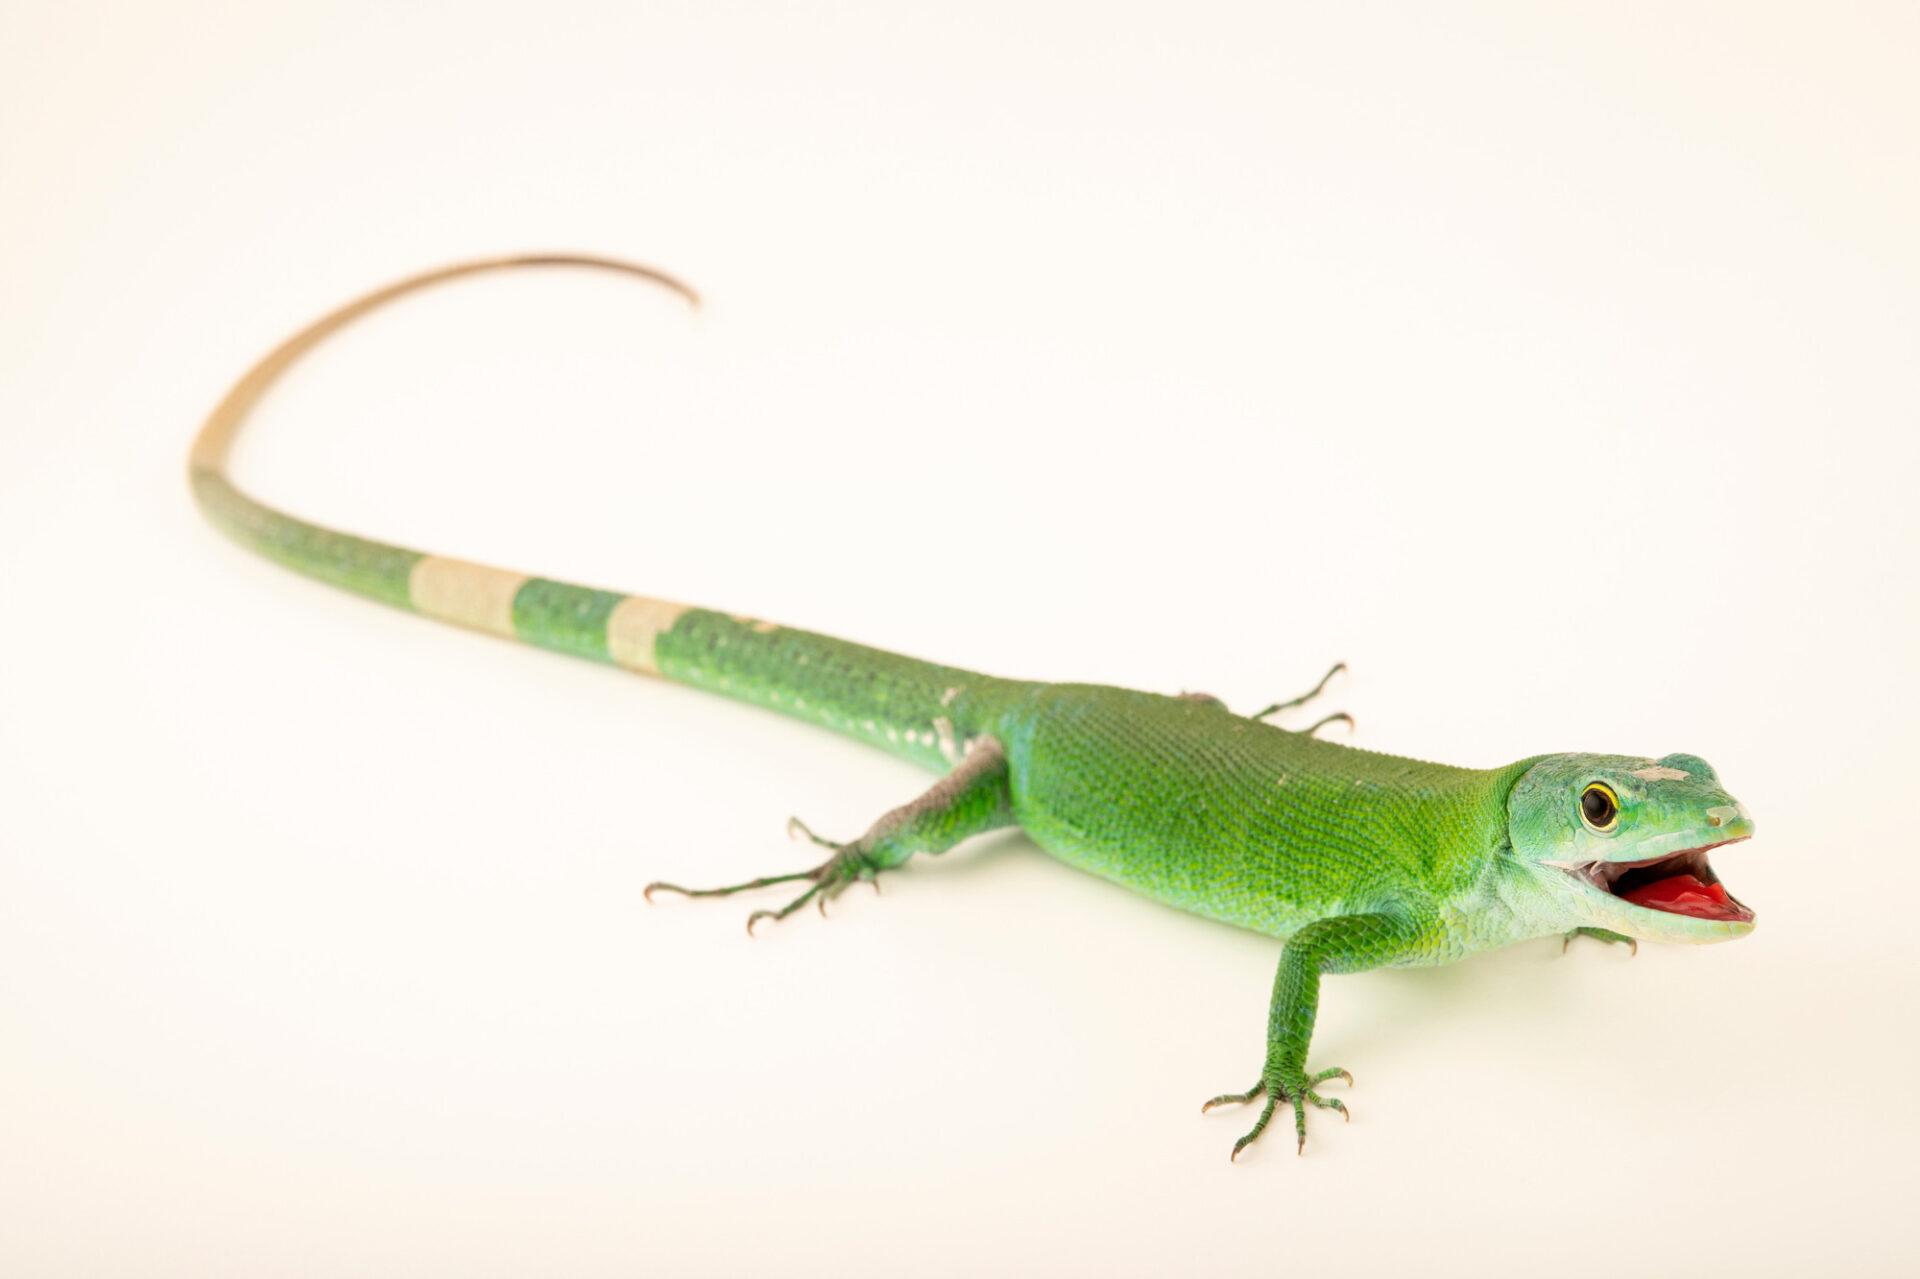 Photo: A green keel-bellied lizard (Gastropholis prasina) at Aquarium Berlin.